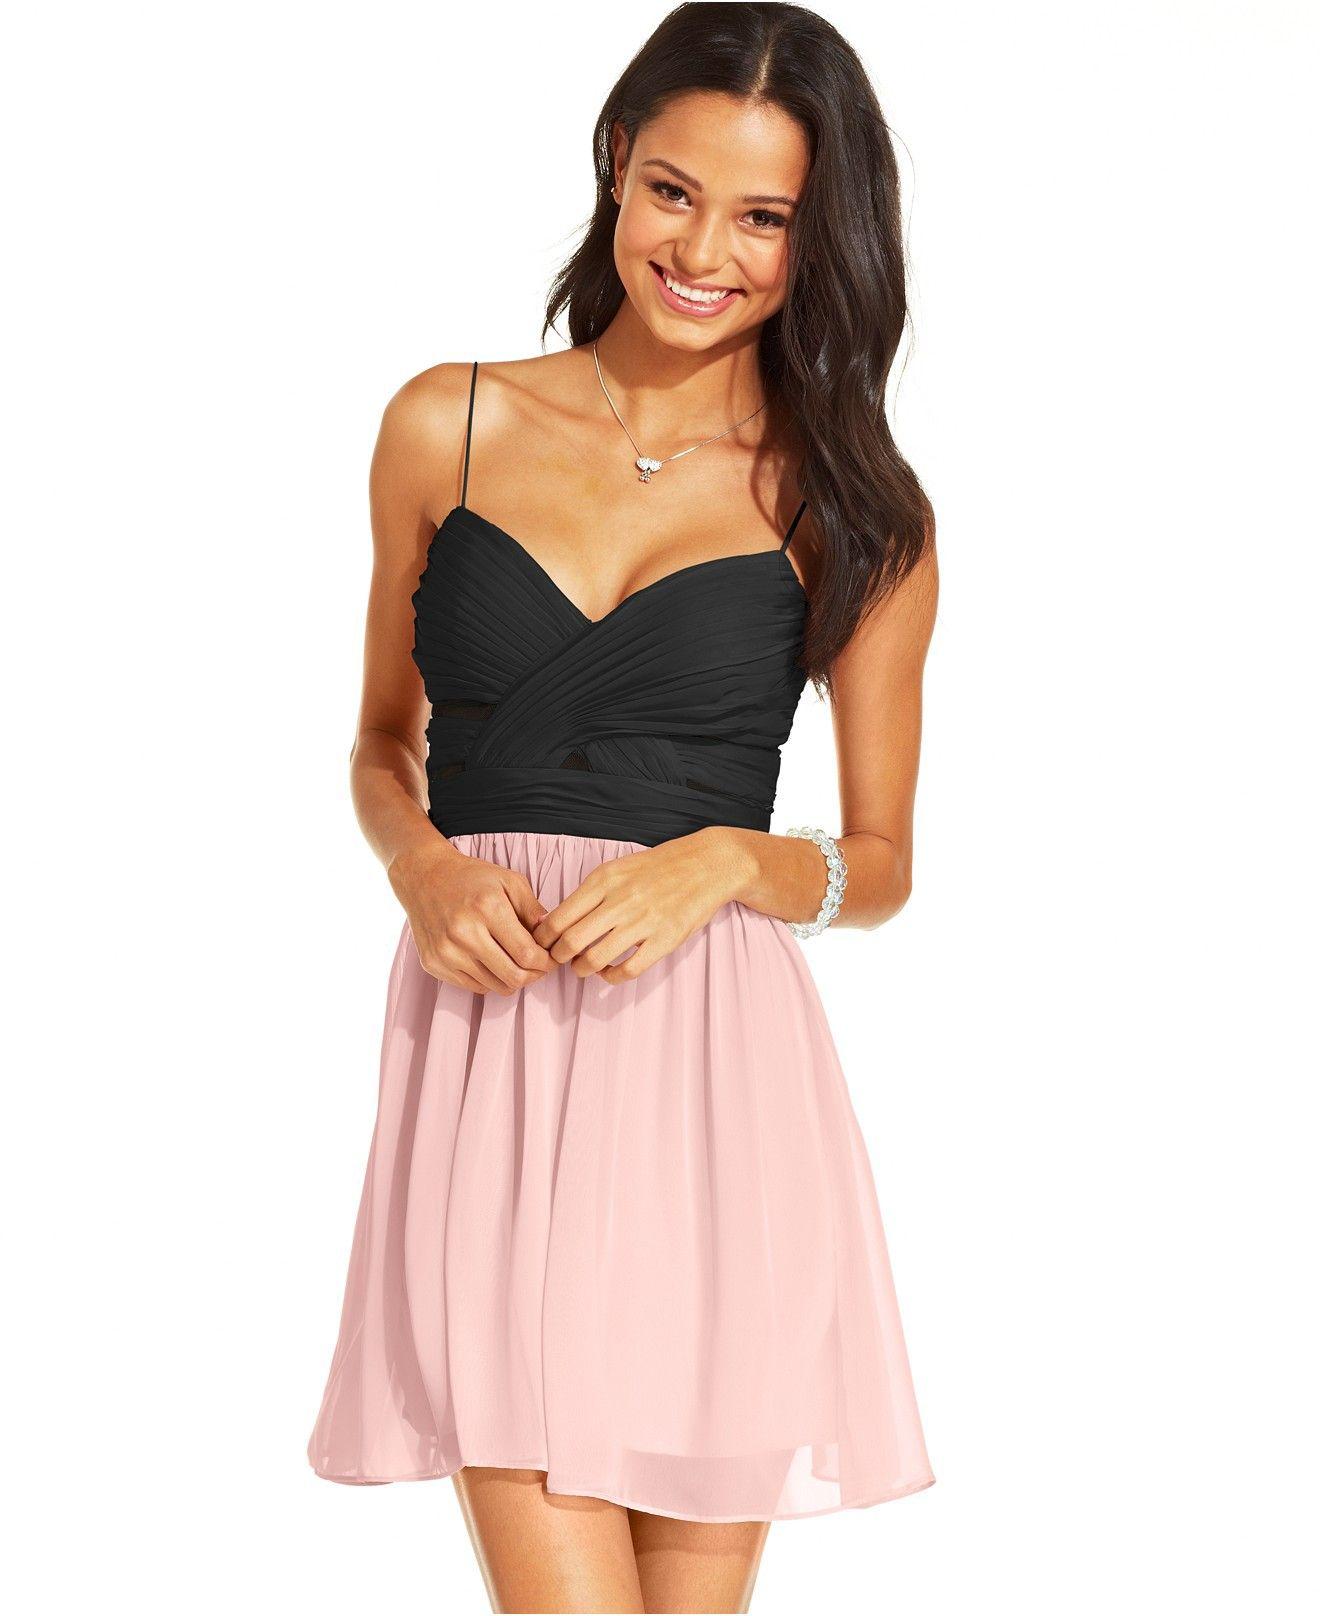 Juniorsu colorblock aline dress fashionallo couturerunway